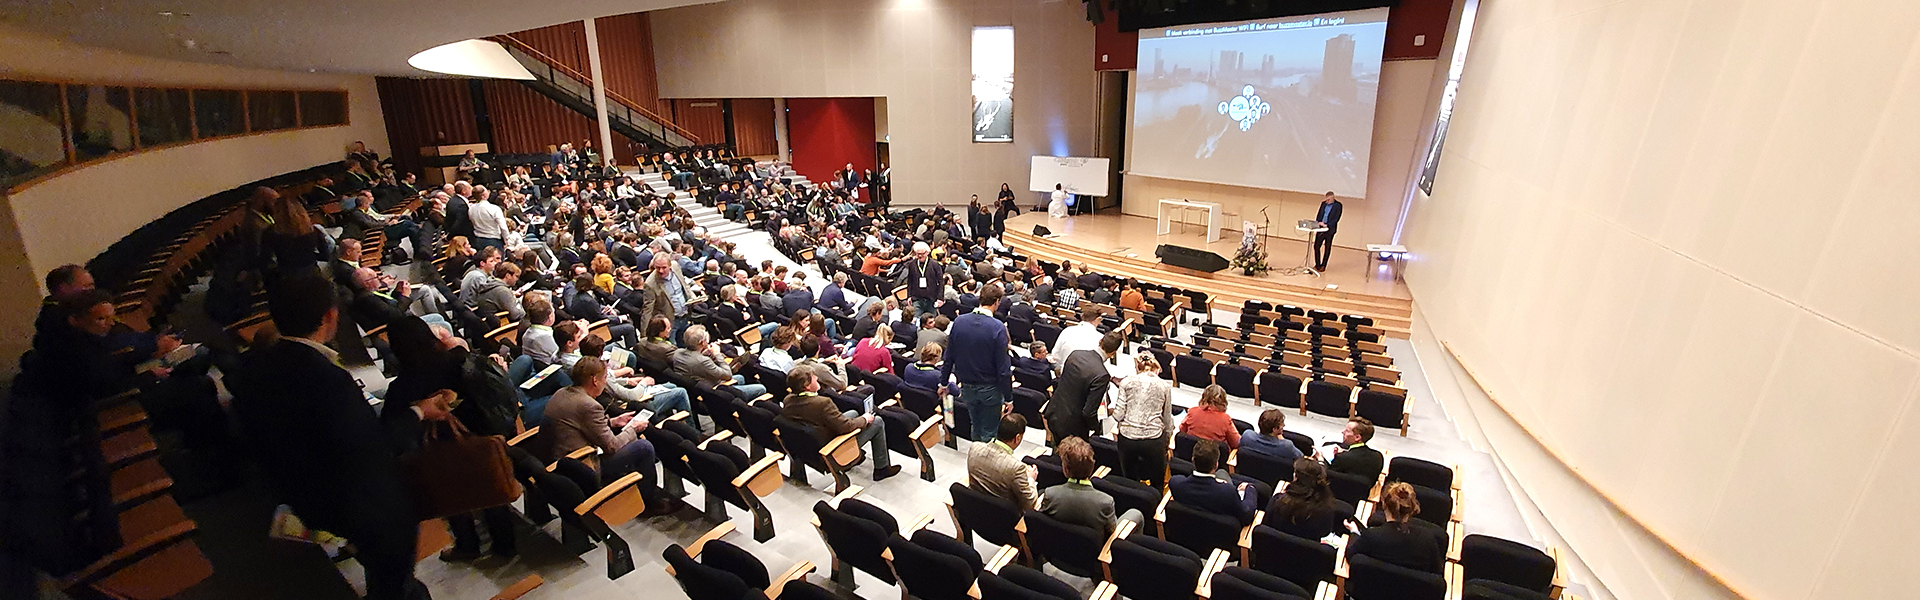 Transformatiecongres Doelen Rotterdam